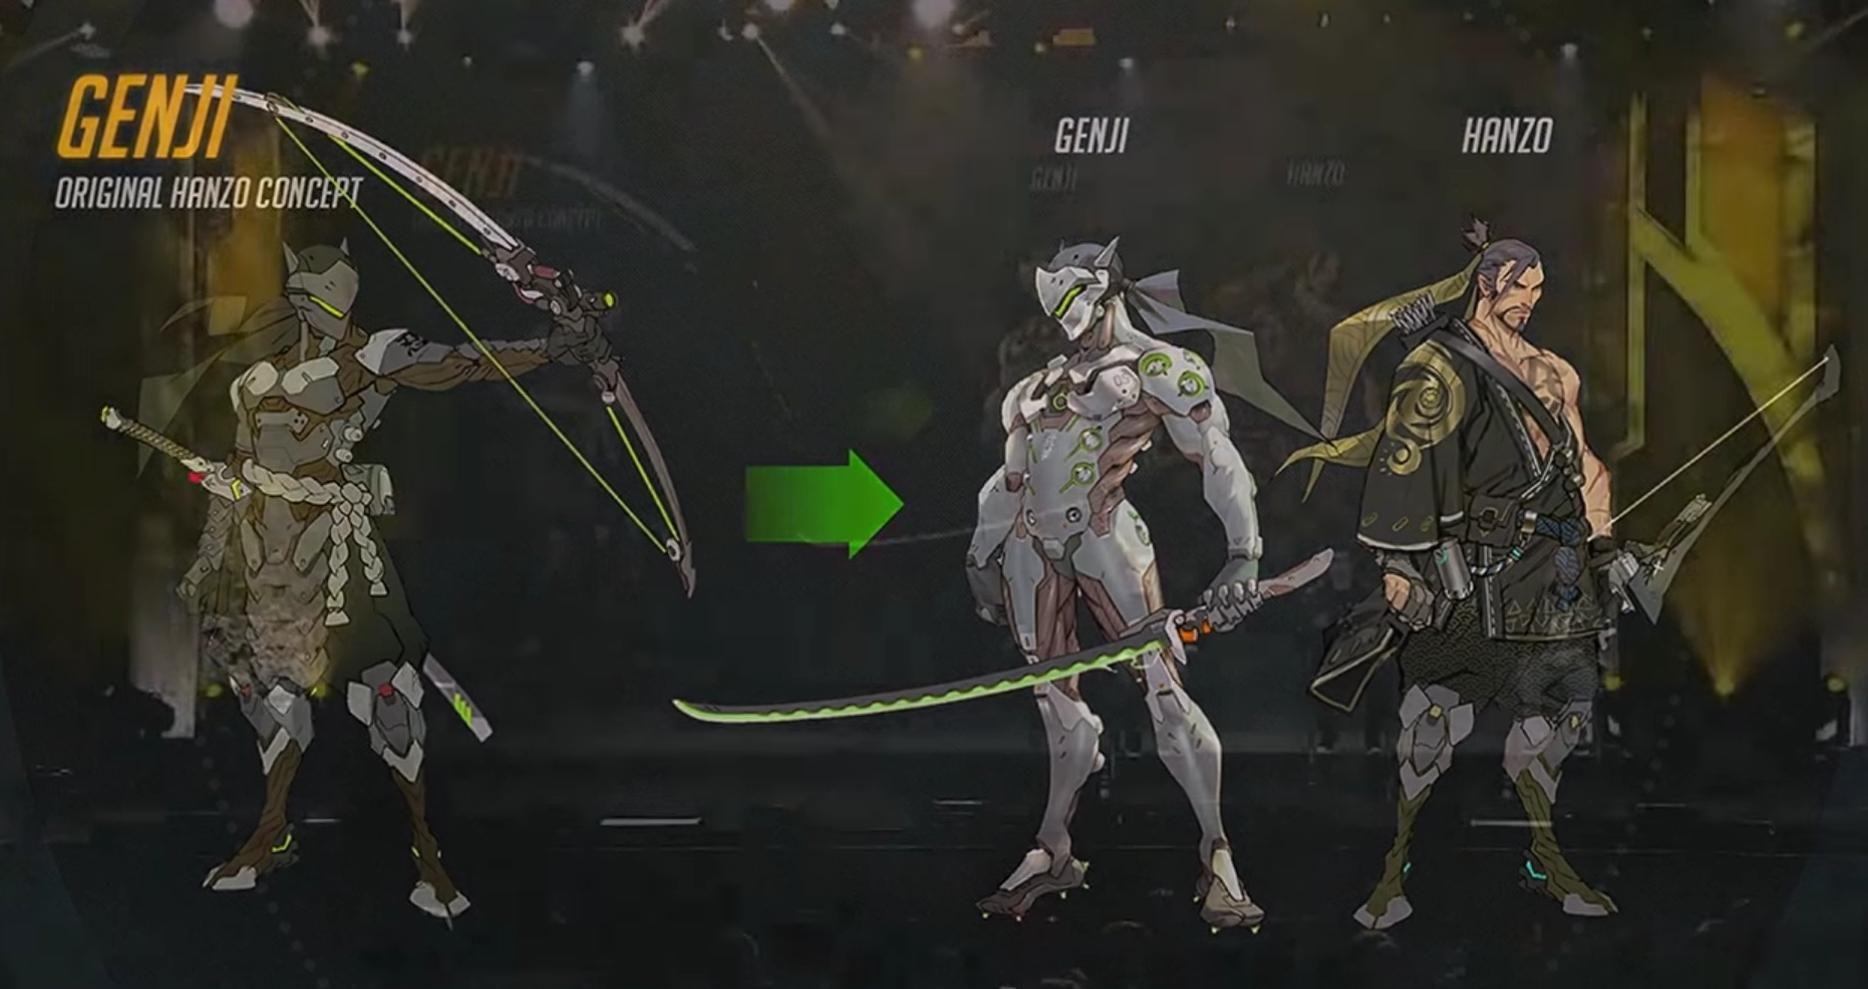 Overwatch Character Design Analysis : Mei genji d va early concepts concept album overwatch